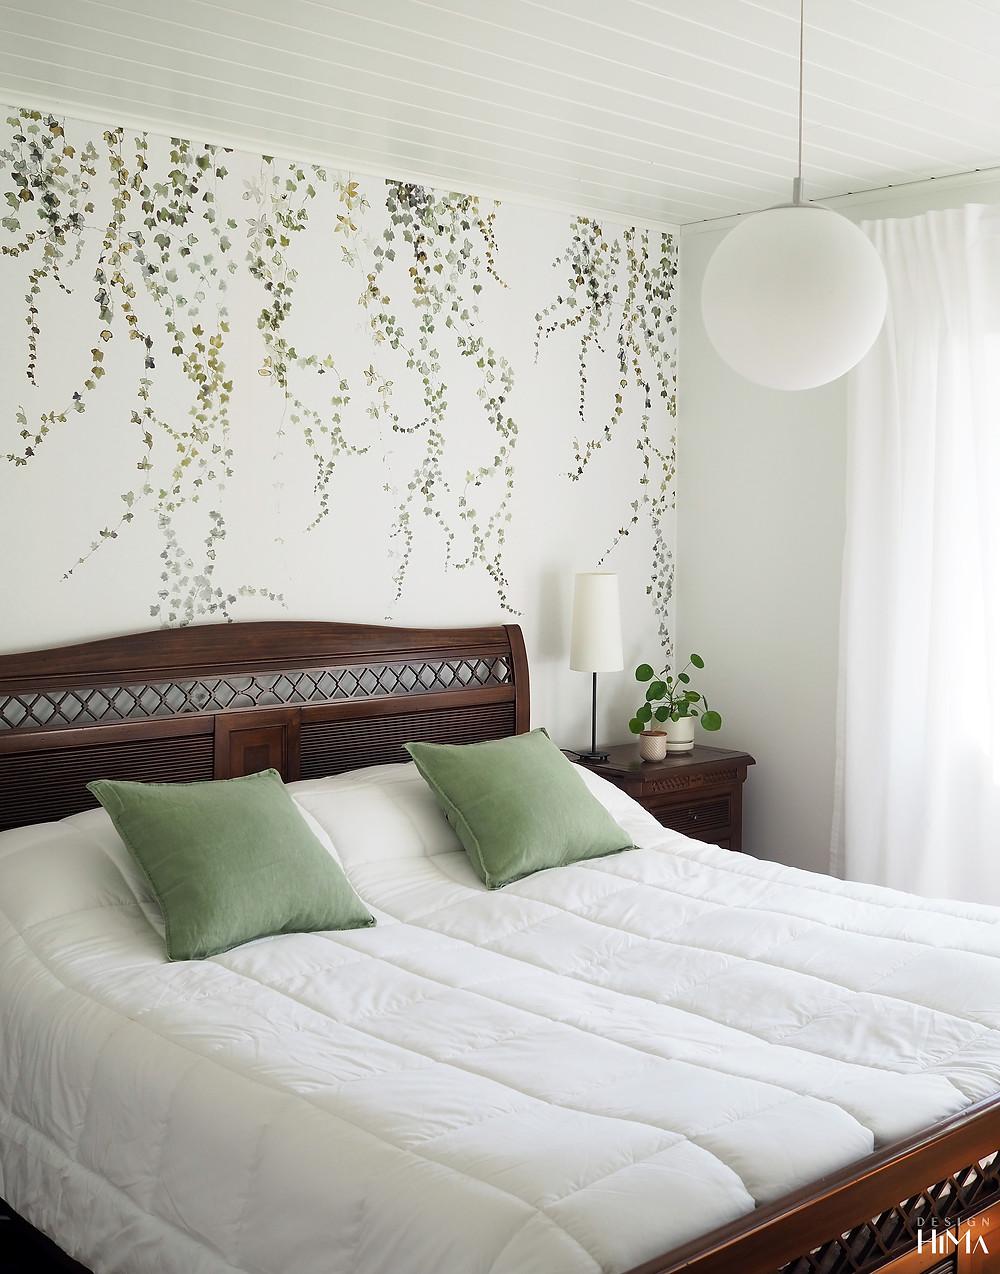 Sandberg Aralia tapettipaneeli makuuhuoneessa